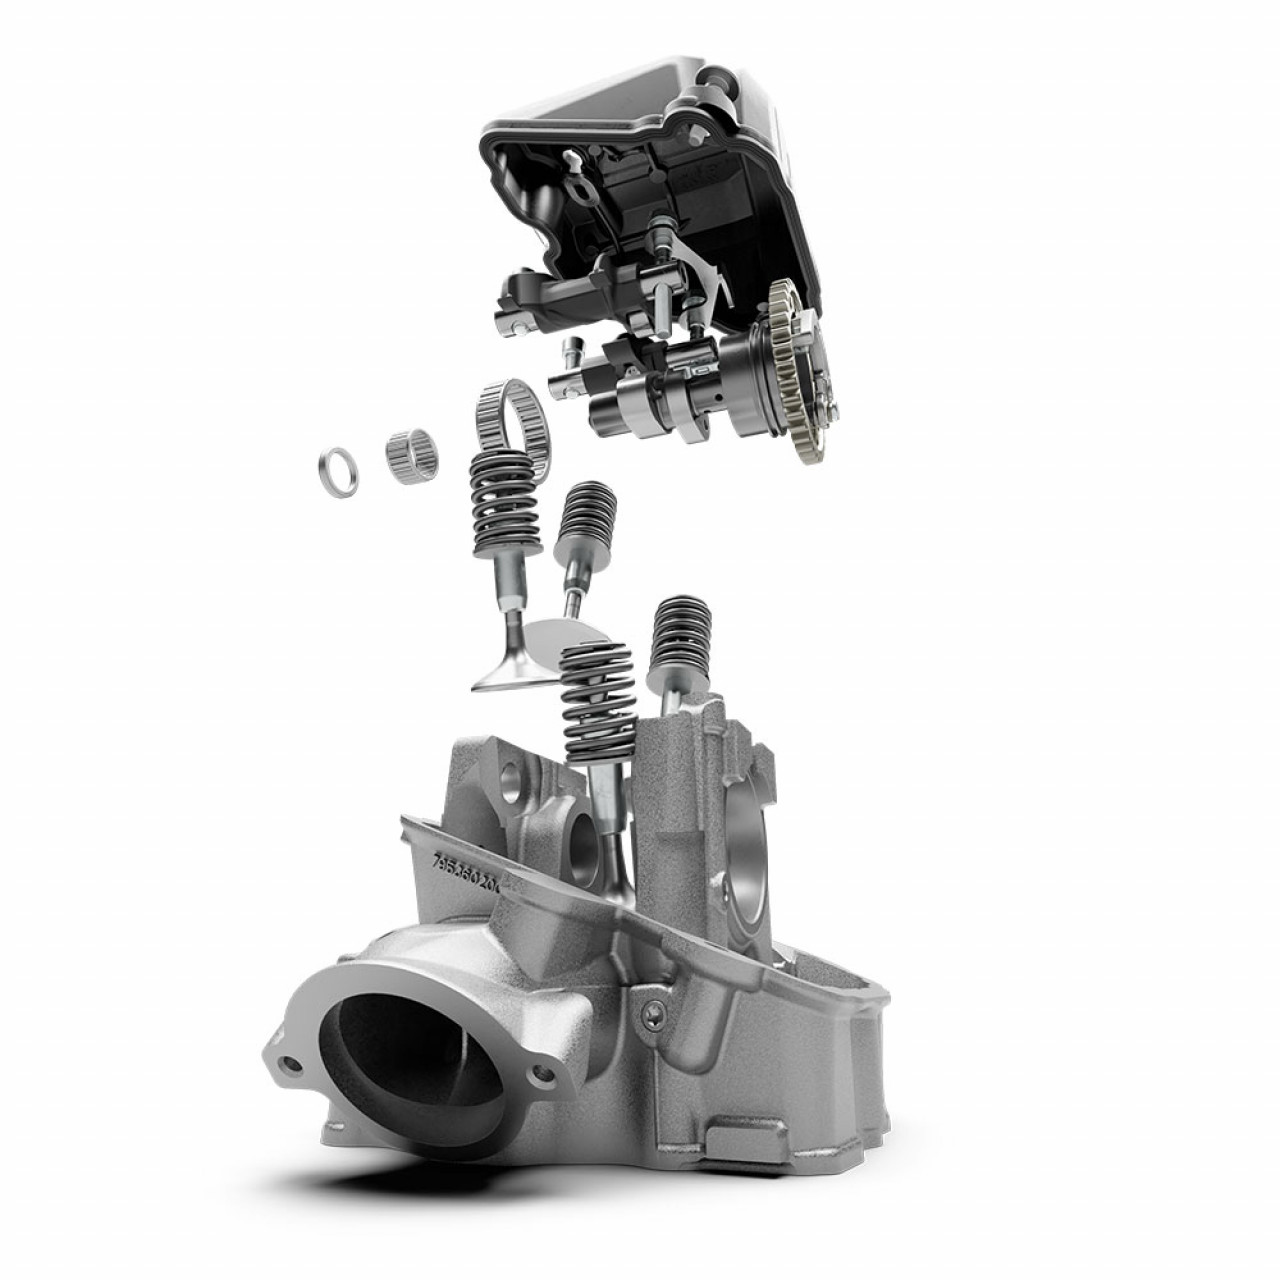 KTM 450 SX-F 2021 - Image 7